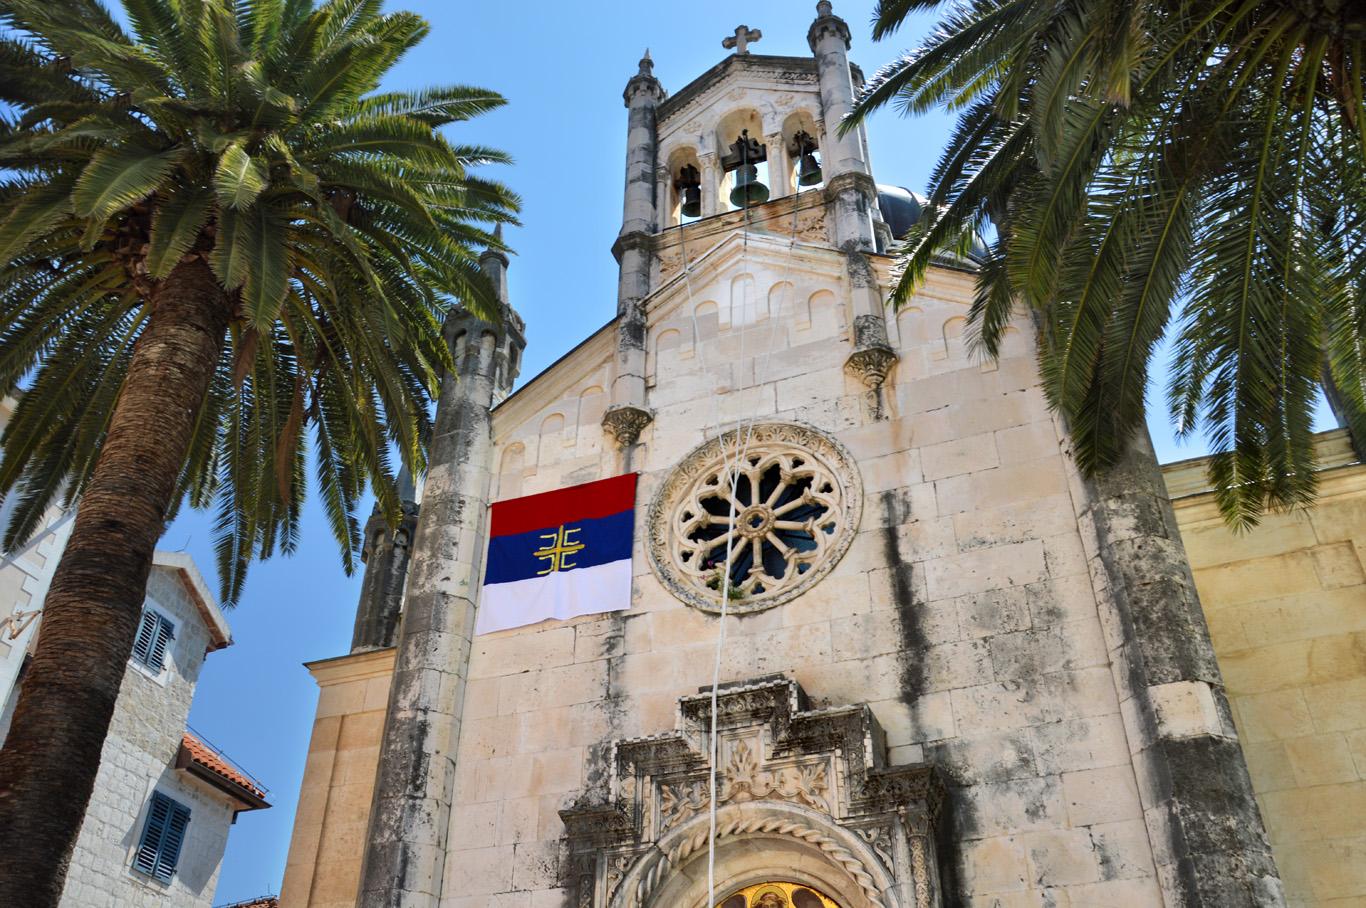 St. Michael Archangel's Church - the facade